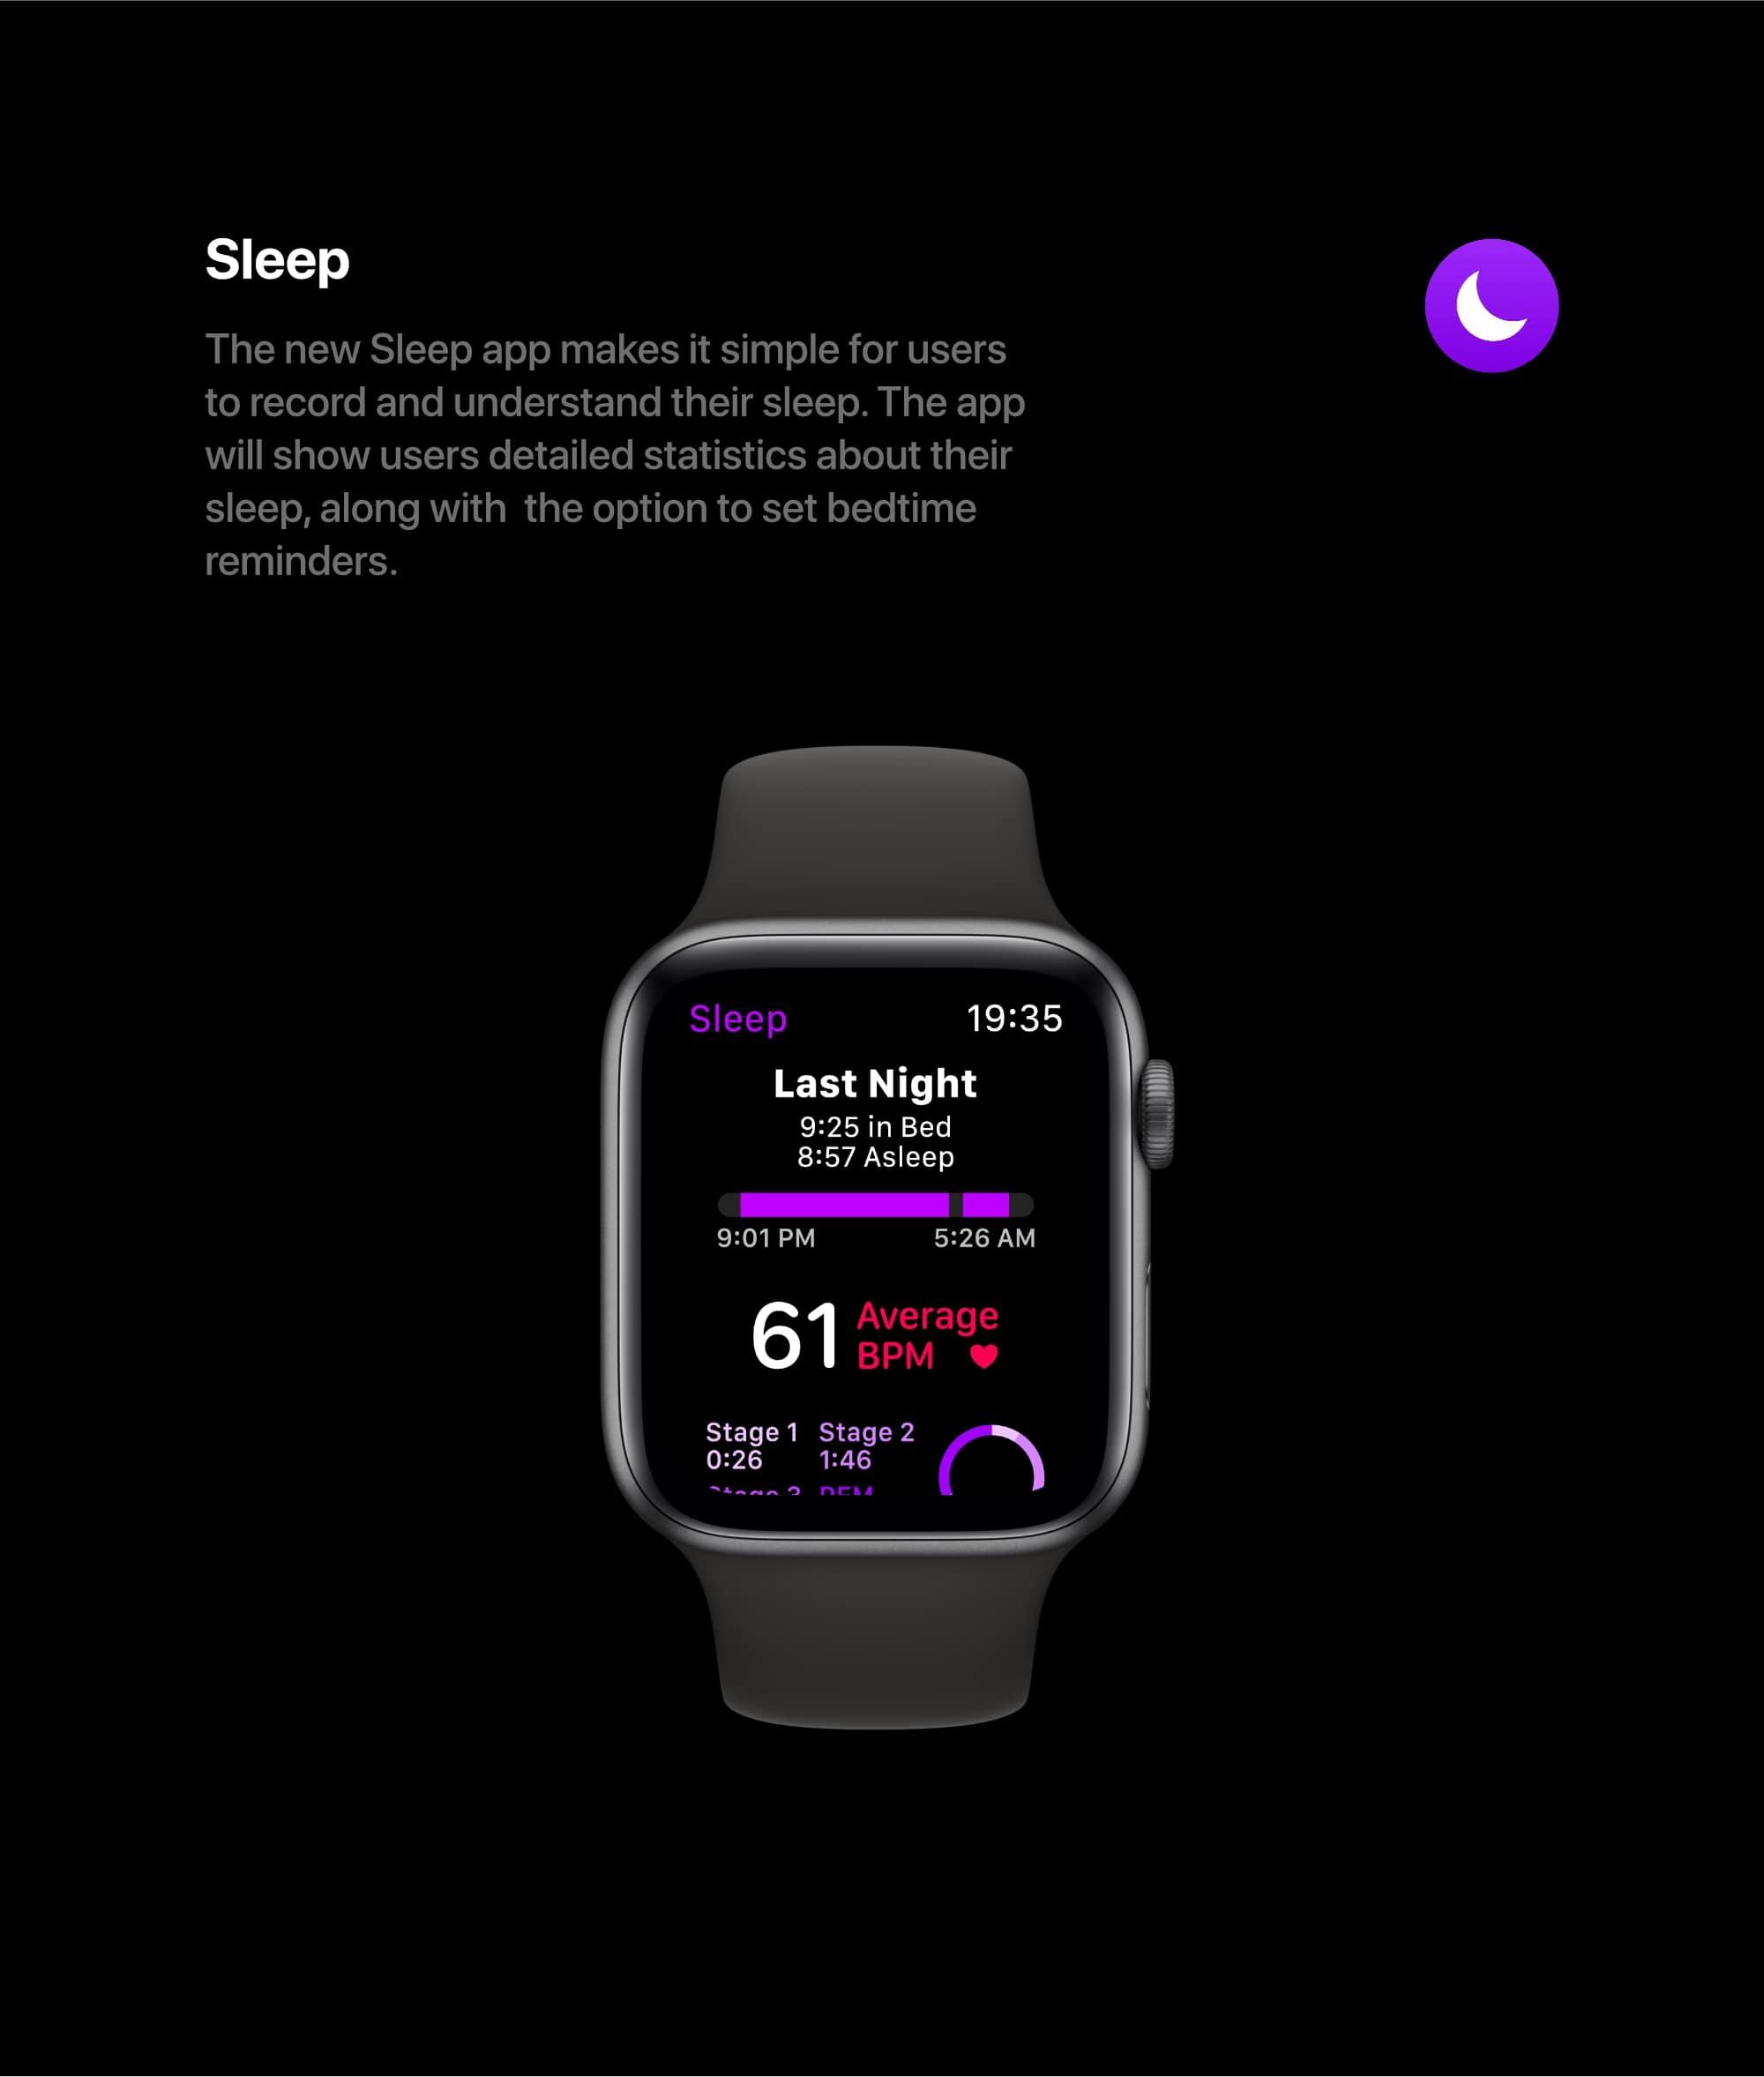 Apple Watch Watch Os 6 Concept 20